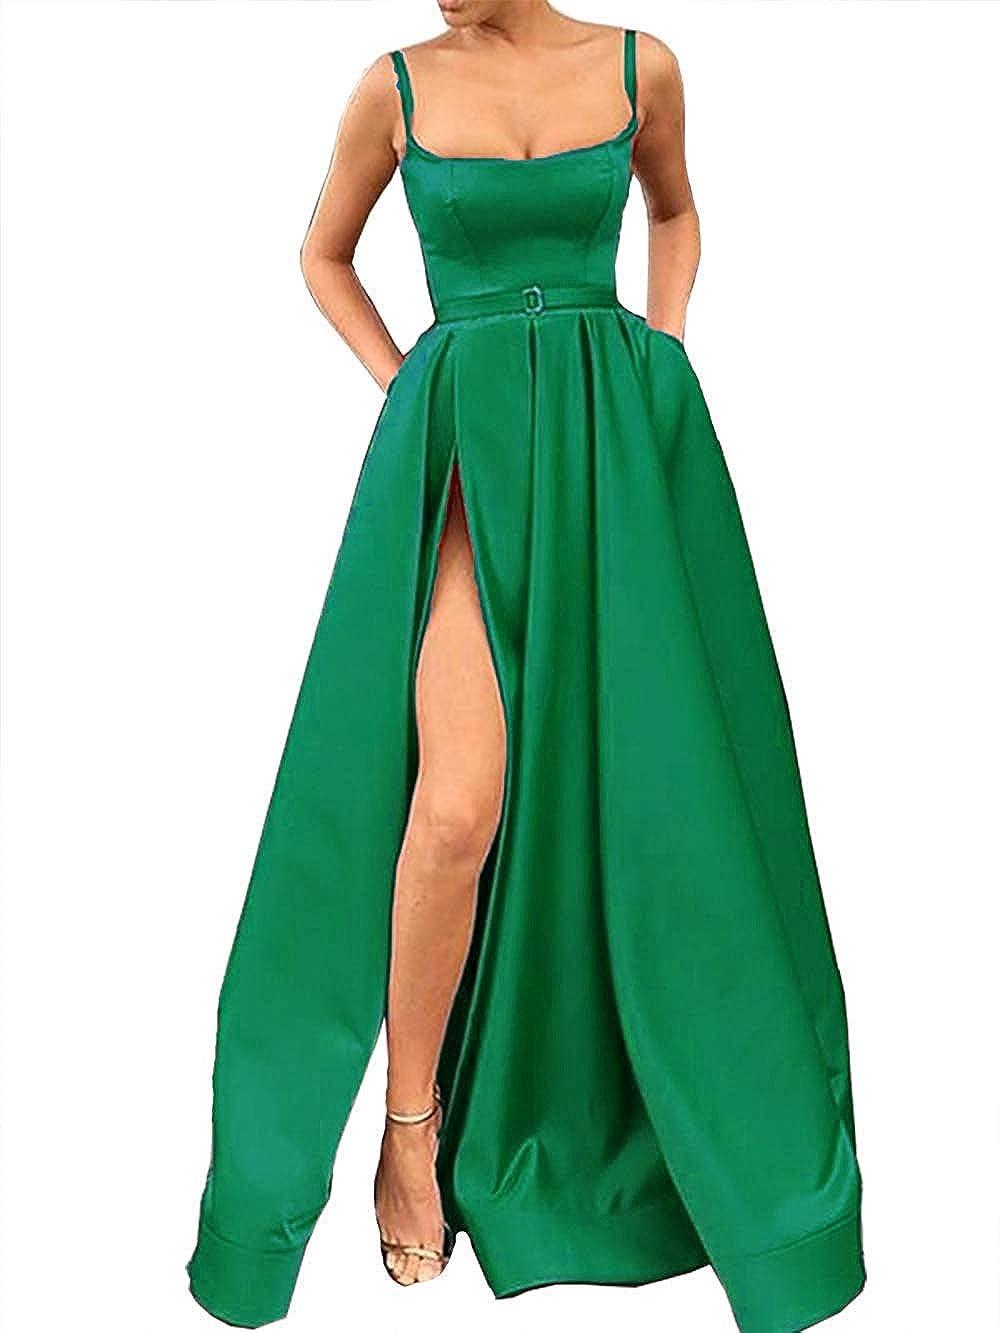 Green XSWPL Sexy Side Split Prom Dresses Long Spaghetti Straps Satin Evening Dress with Pockets